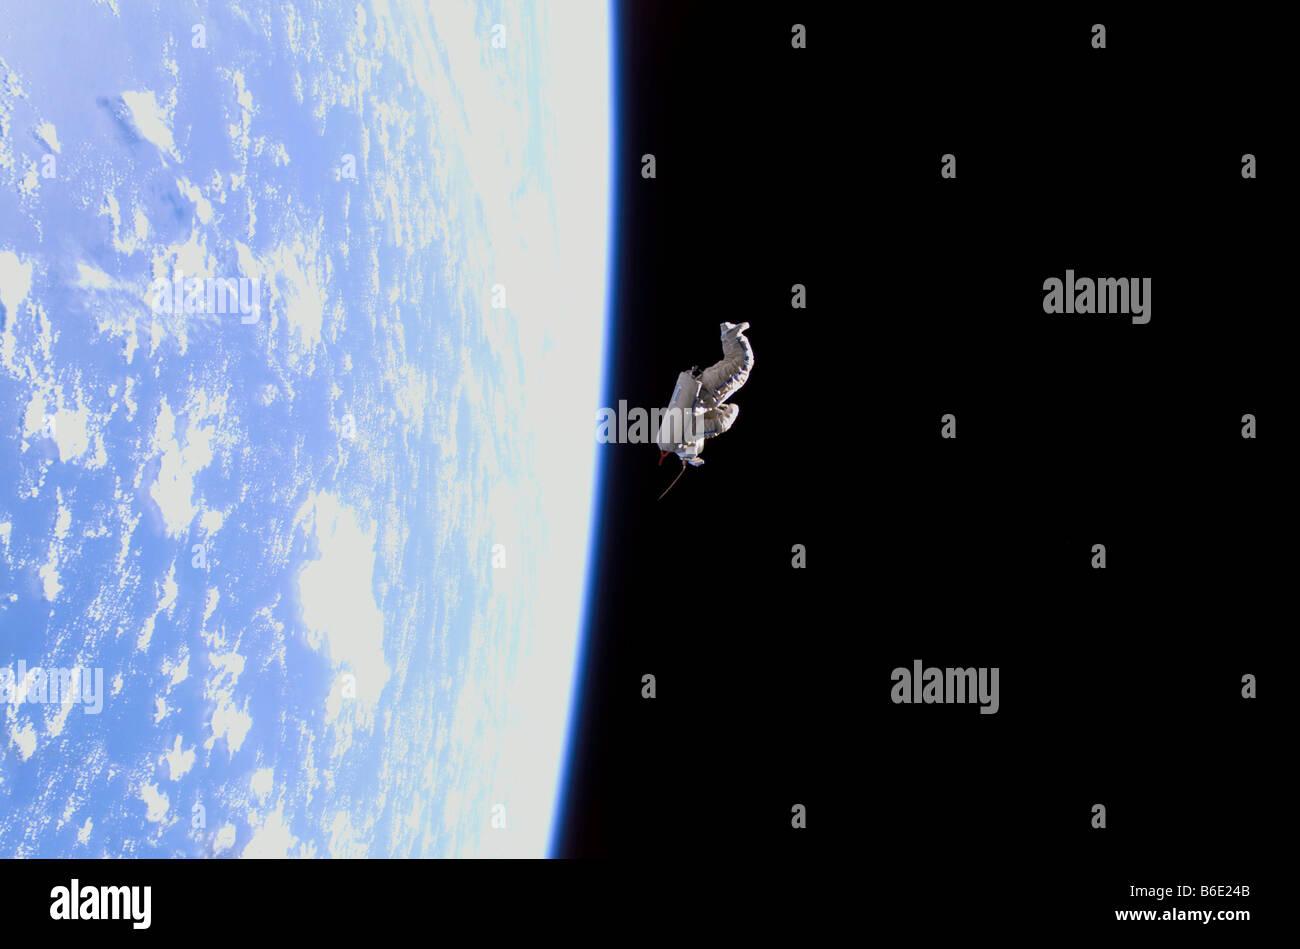 SuitSat space debris. The SuitSat (centre) is anunneeded Russian Orlan spacesuit. - Stock Image